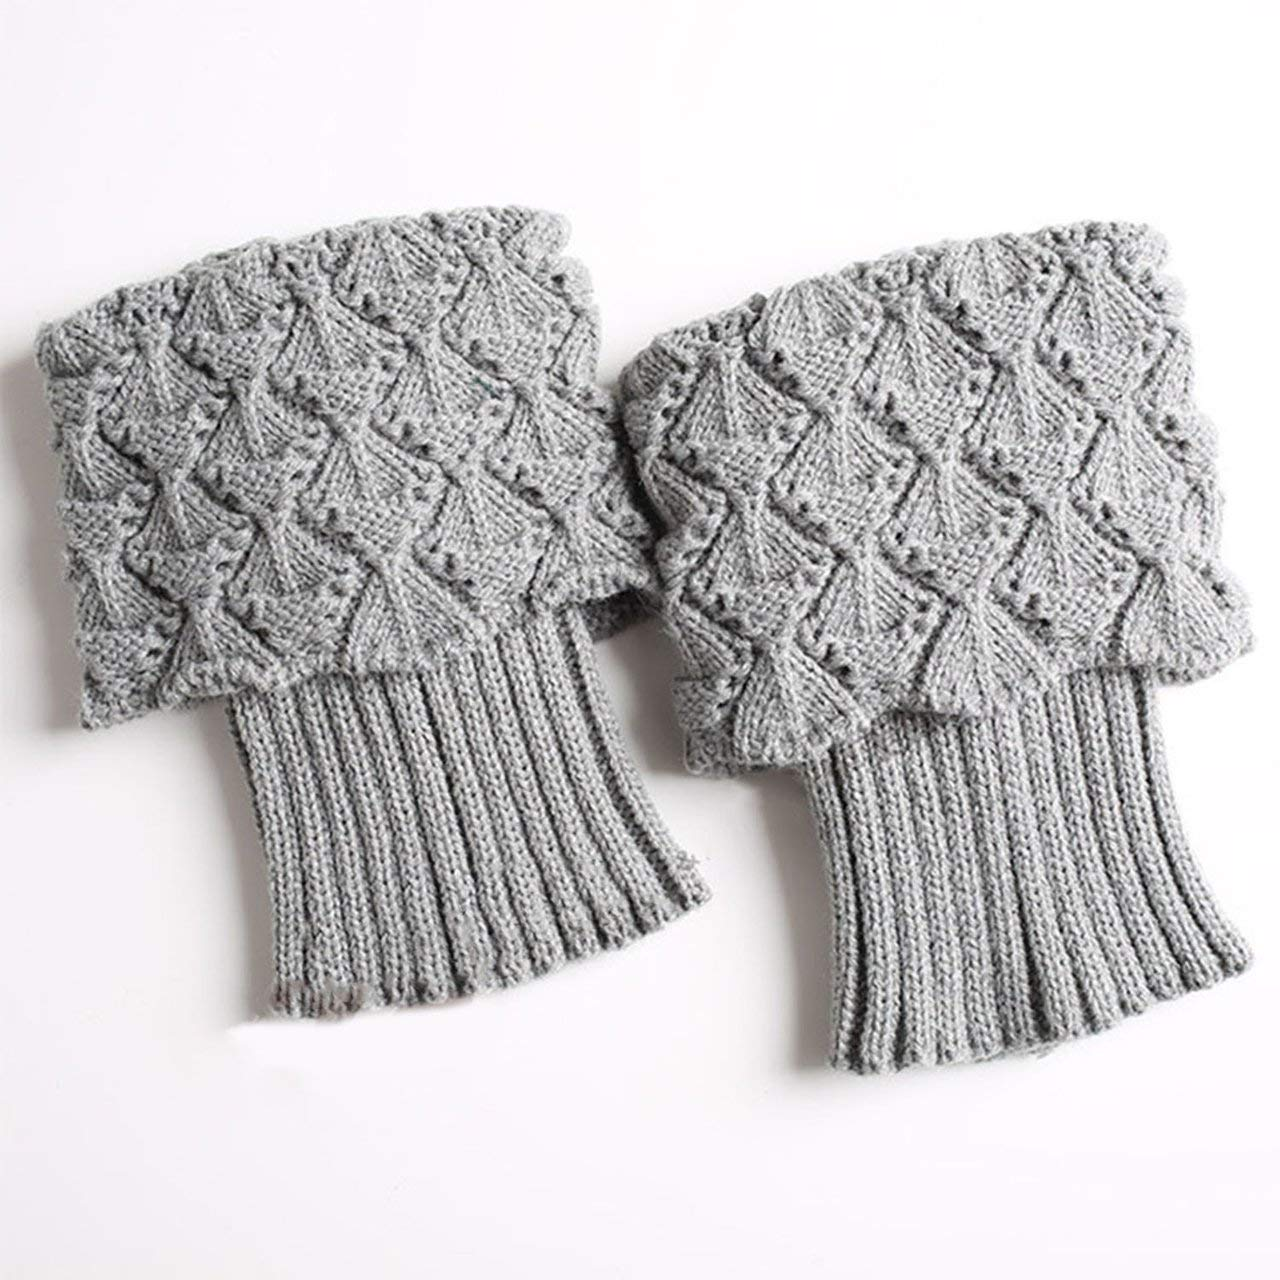 1 Pair Fashion Autumn Winter Women Leg Warmers Female Warm Solid Color Boots Cuffs Knit Leg Warm Socks